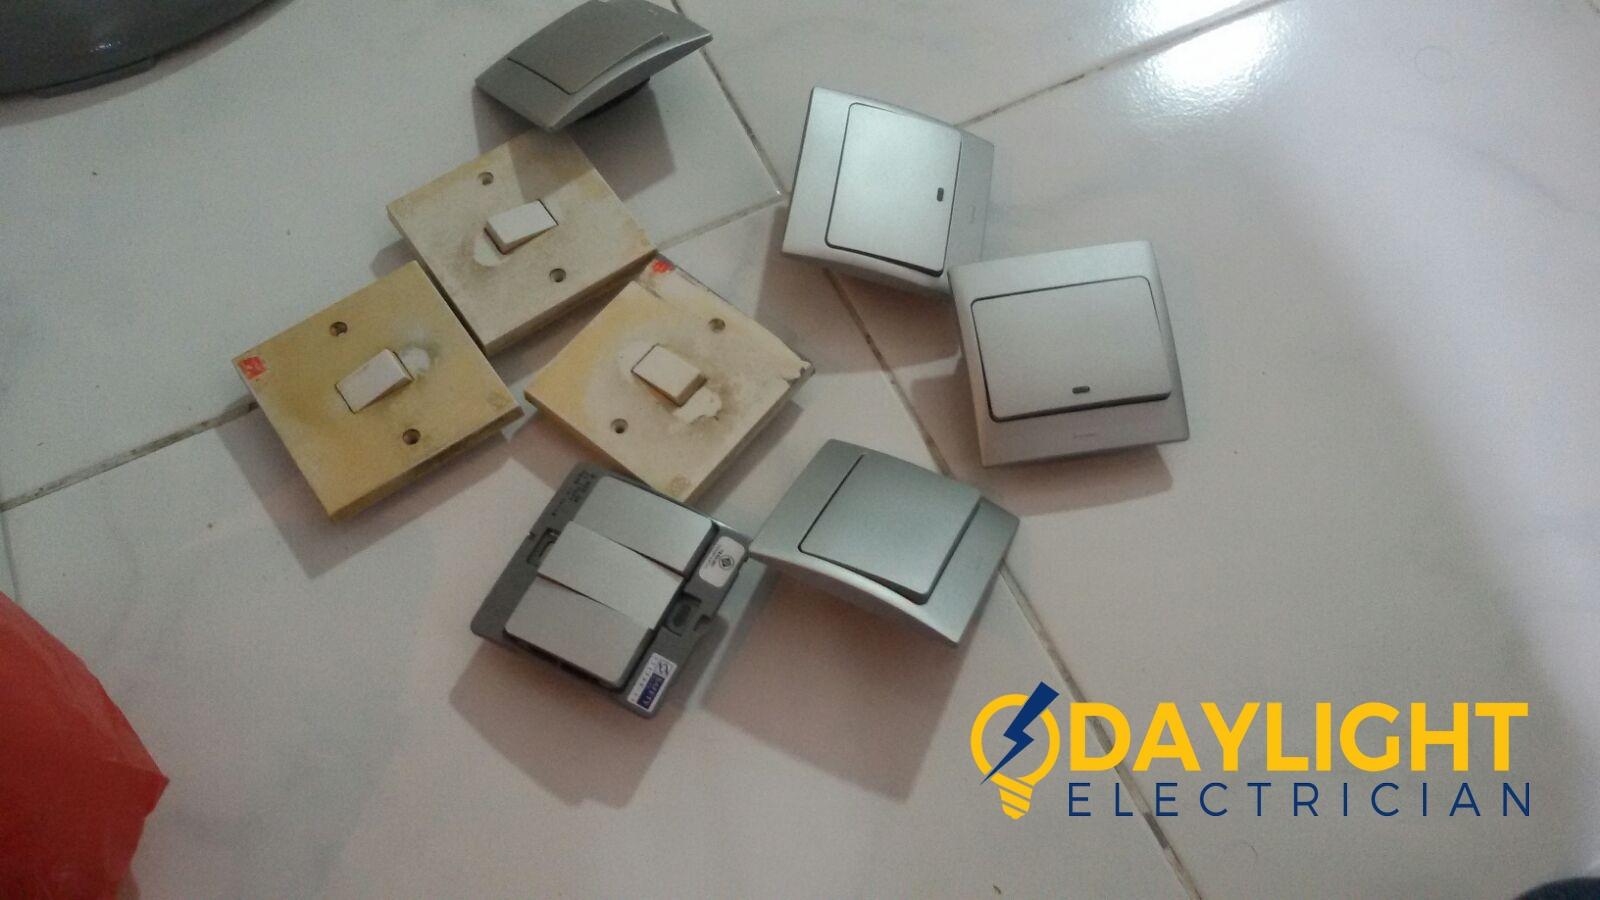 replace-light-switch-electrician-singapore-bedok-hdb-9